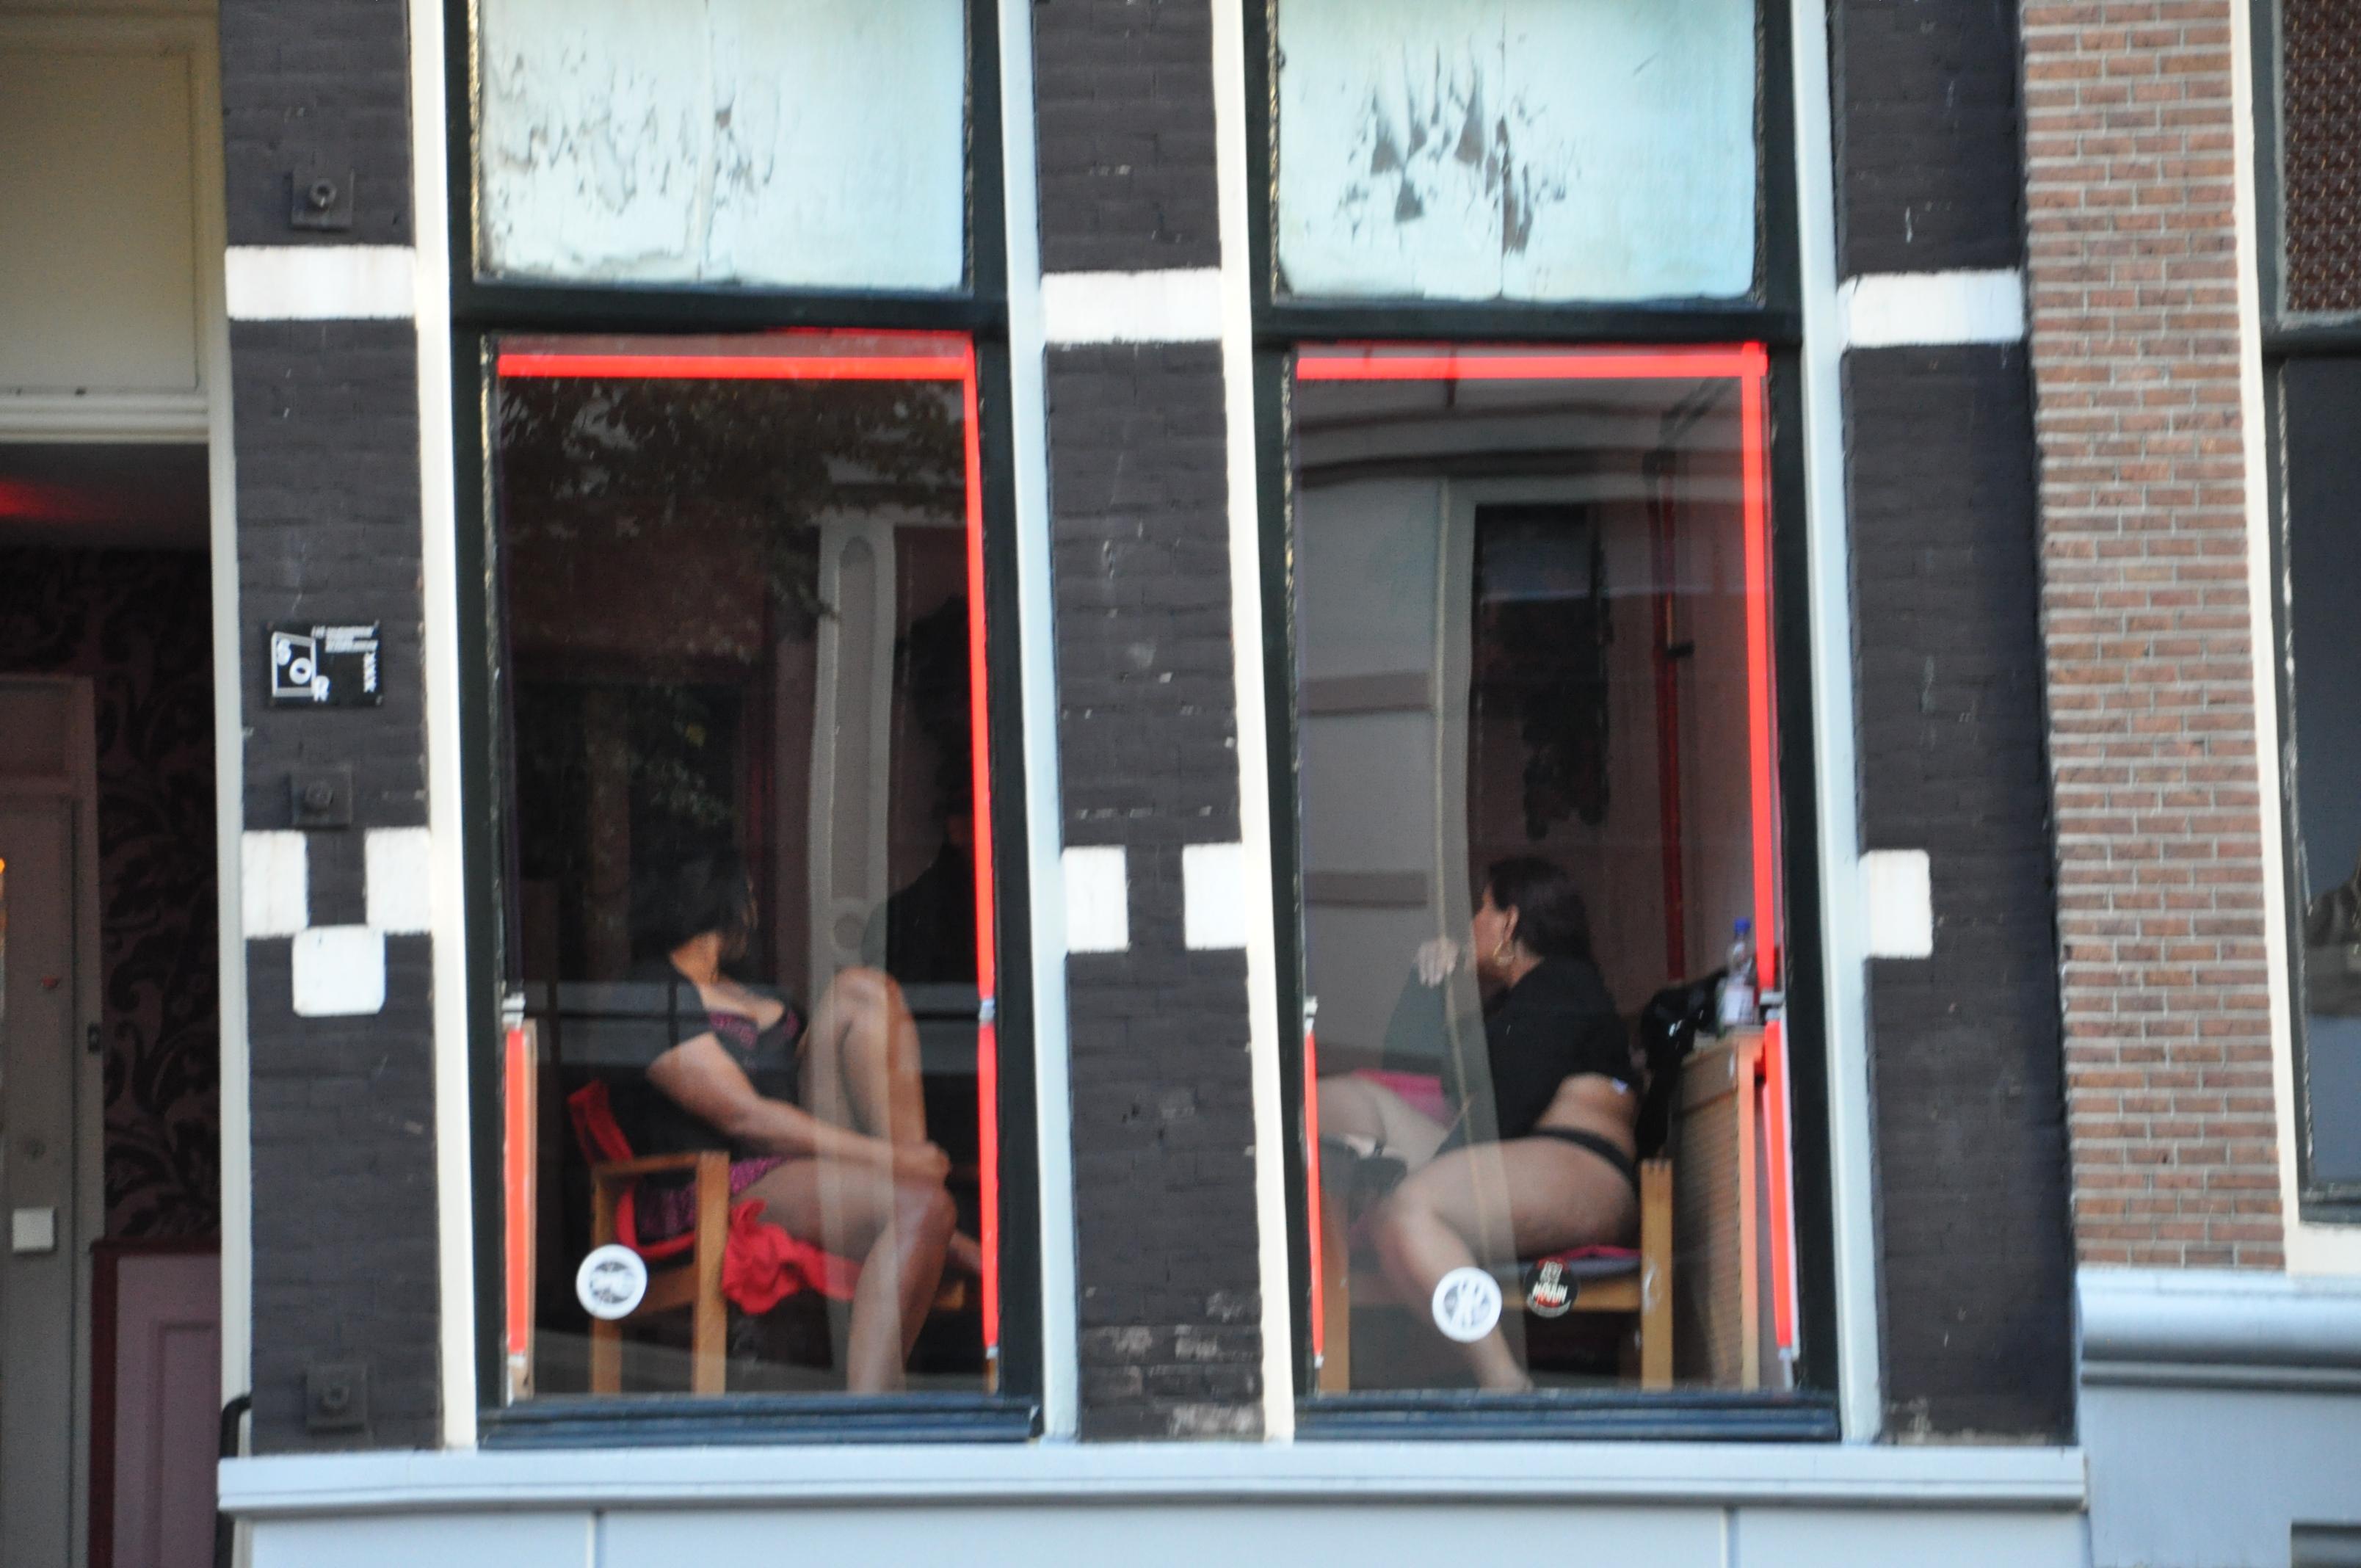 Teen girls in Amsterdam